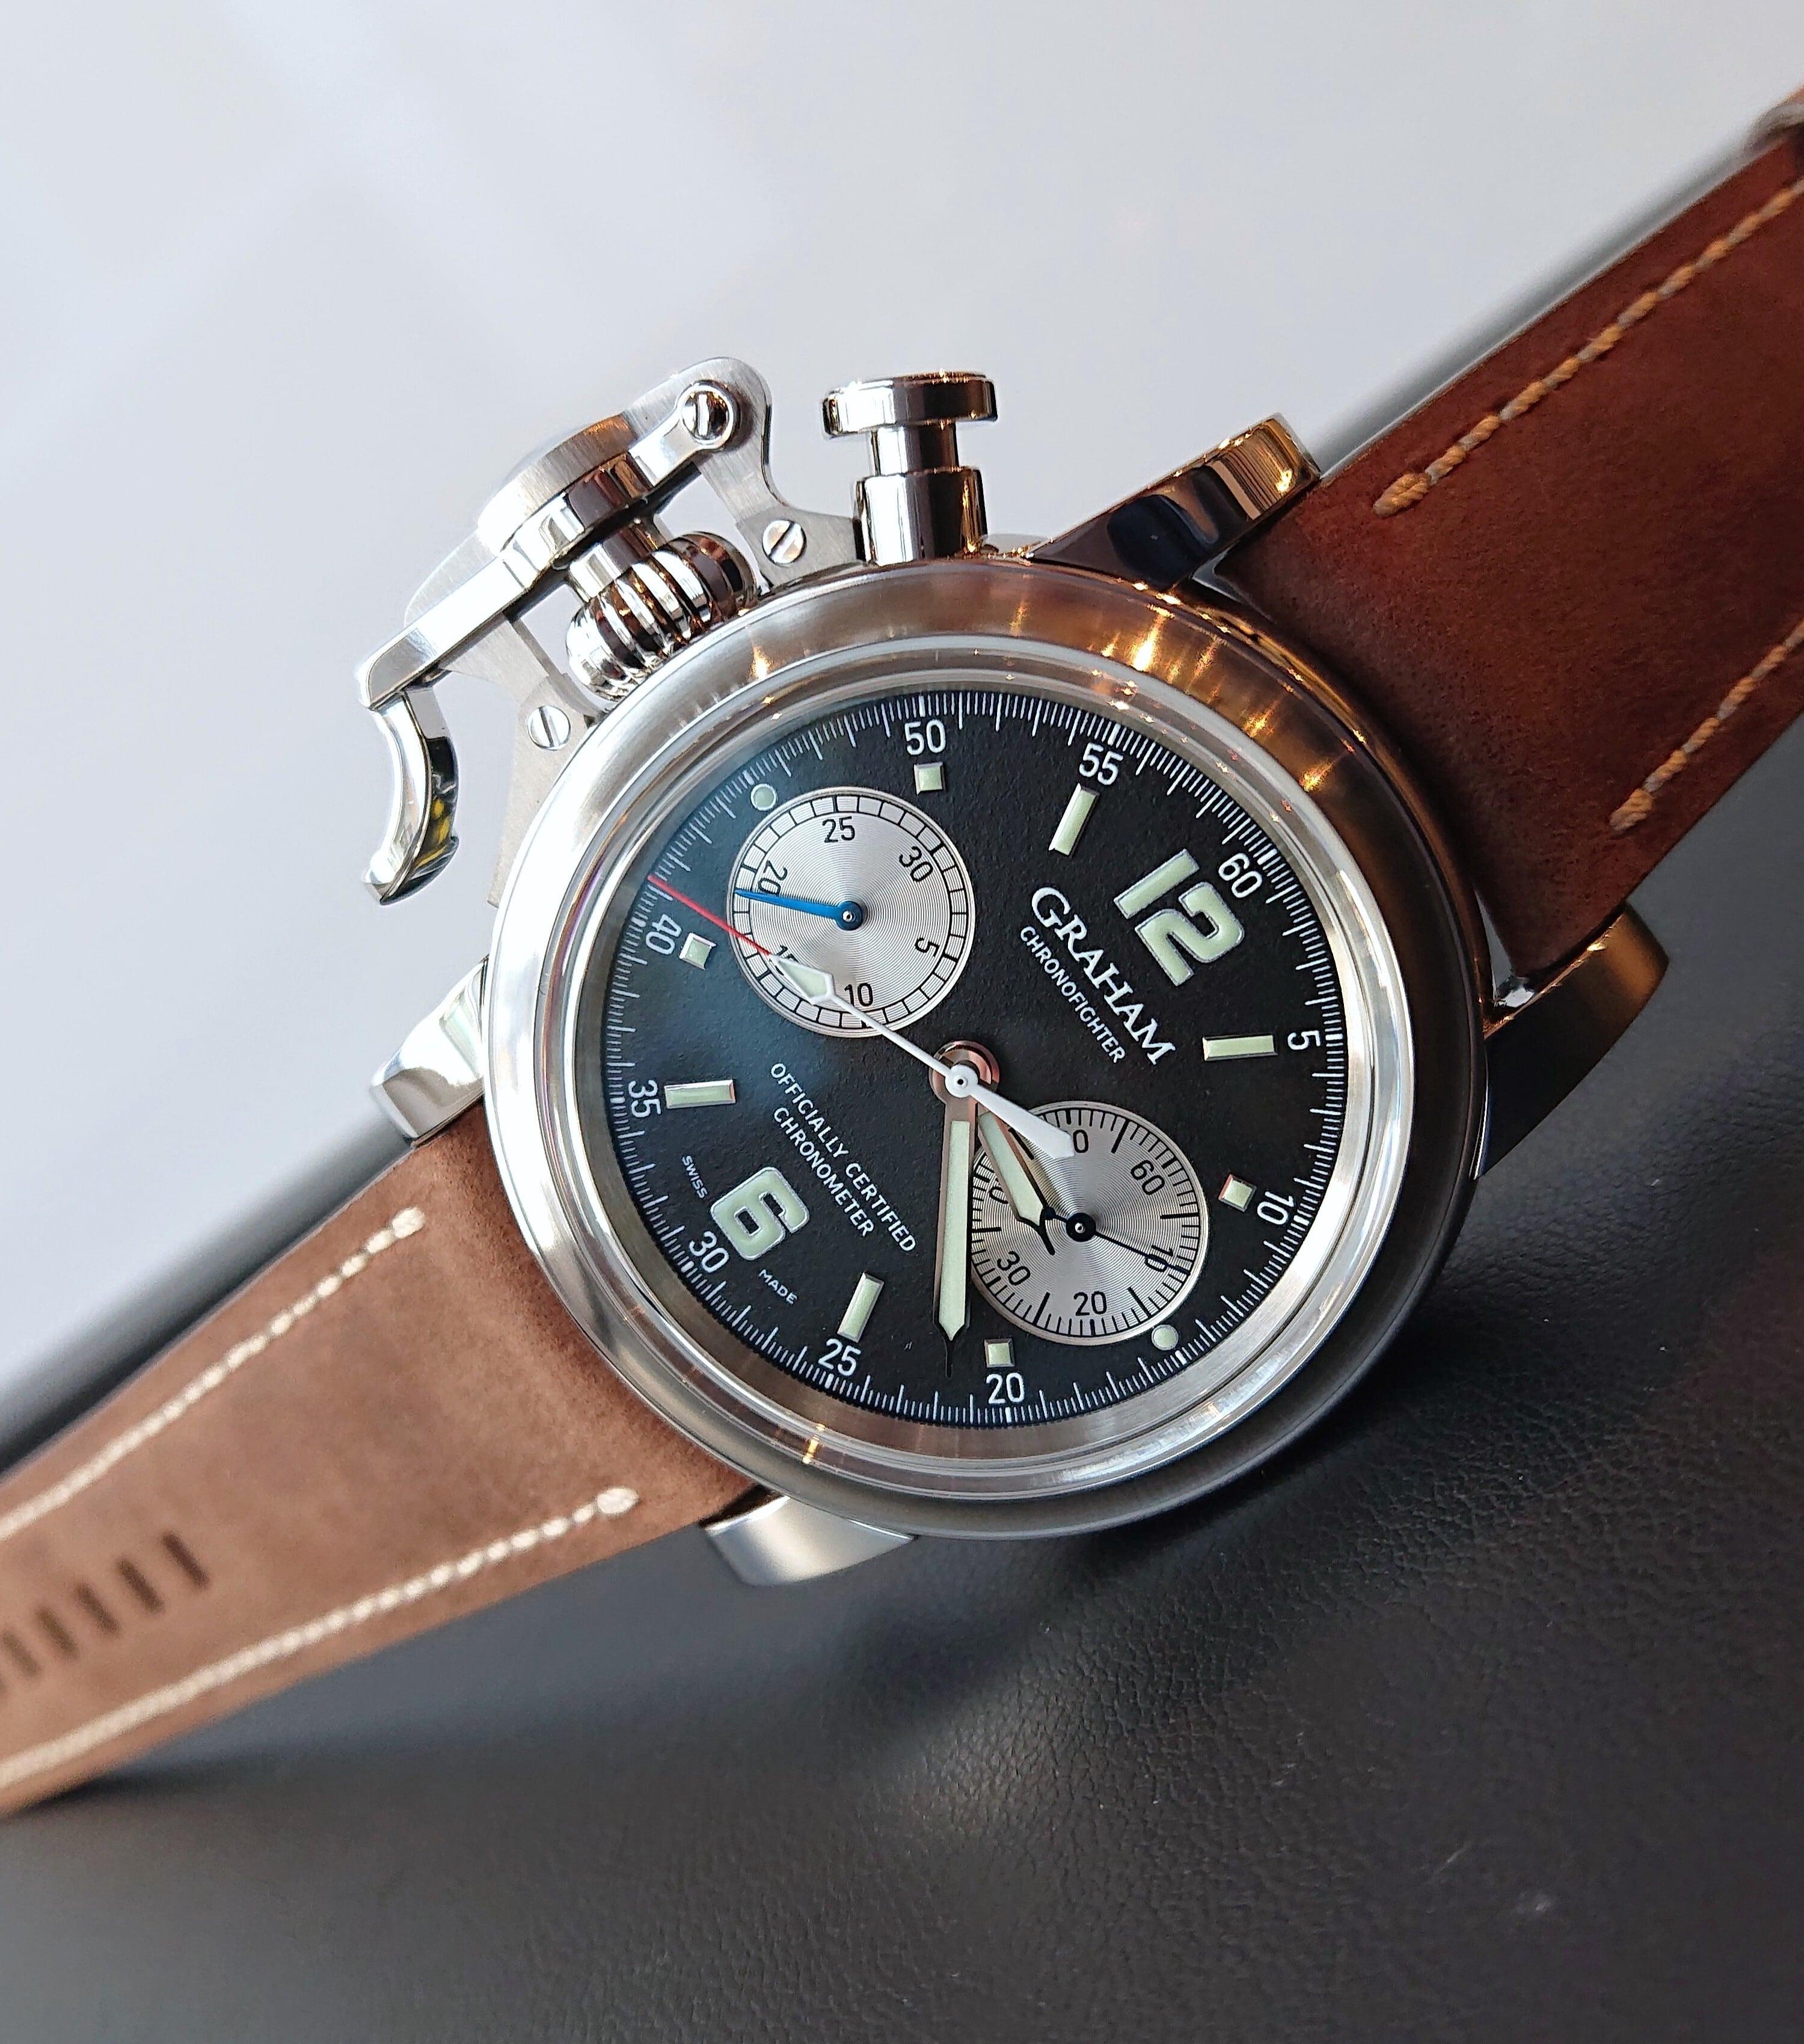 【GRAHAM グラハム】世界限定25本 Chronofighter Vintage 25th Anniversary クロノファイターヴィンテージ 25周年記念モデル/国内正規品 腕時計